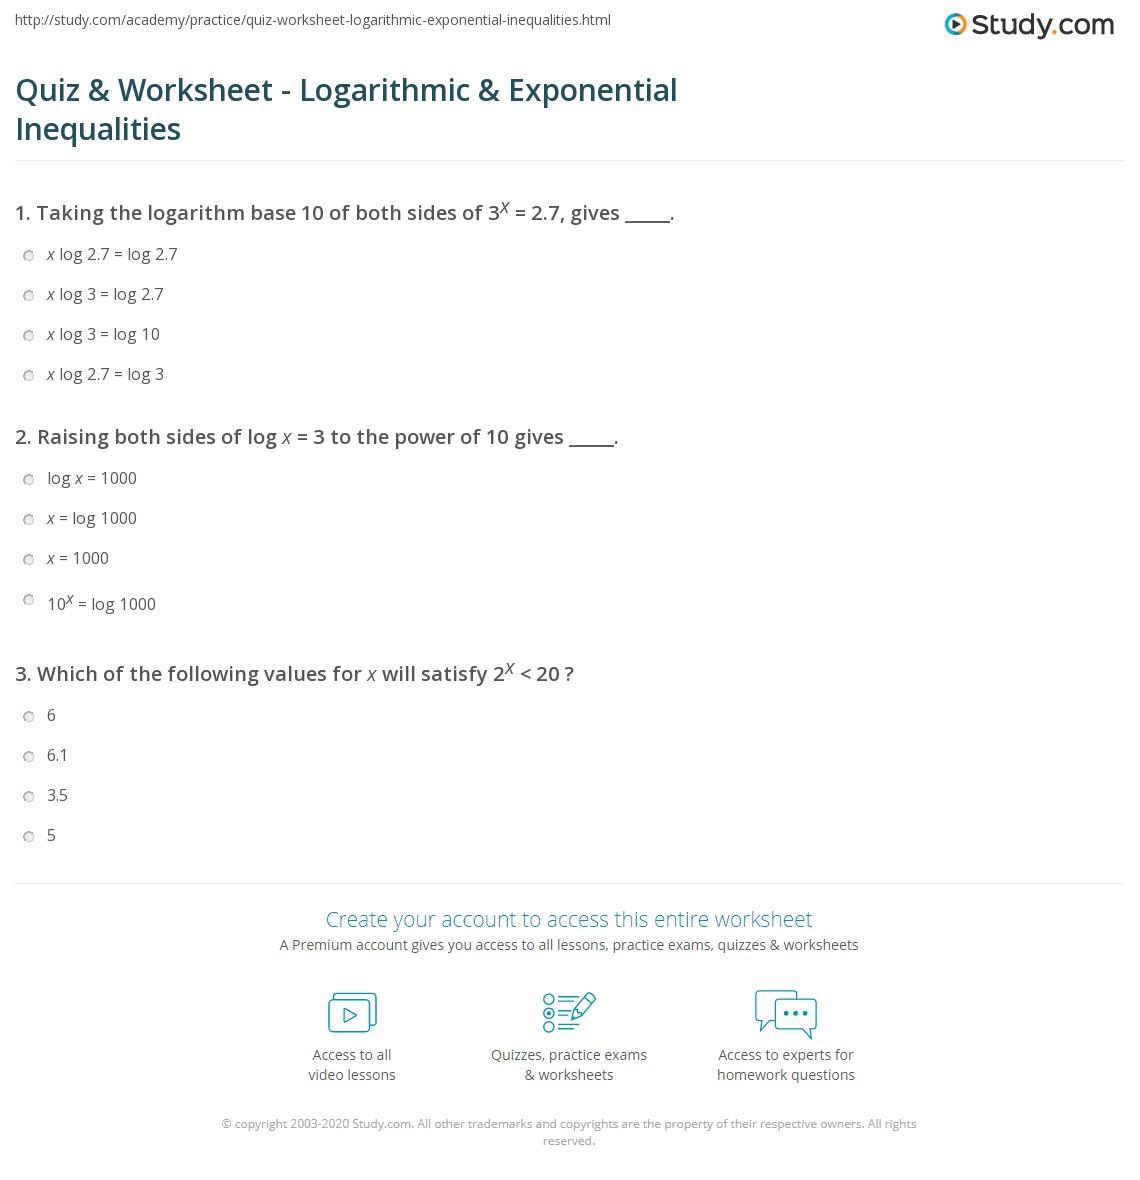 Quiz & Worksheet - Logarithmic & Exponential Inequalities   Study.com